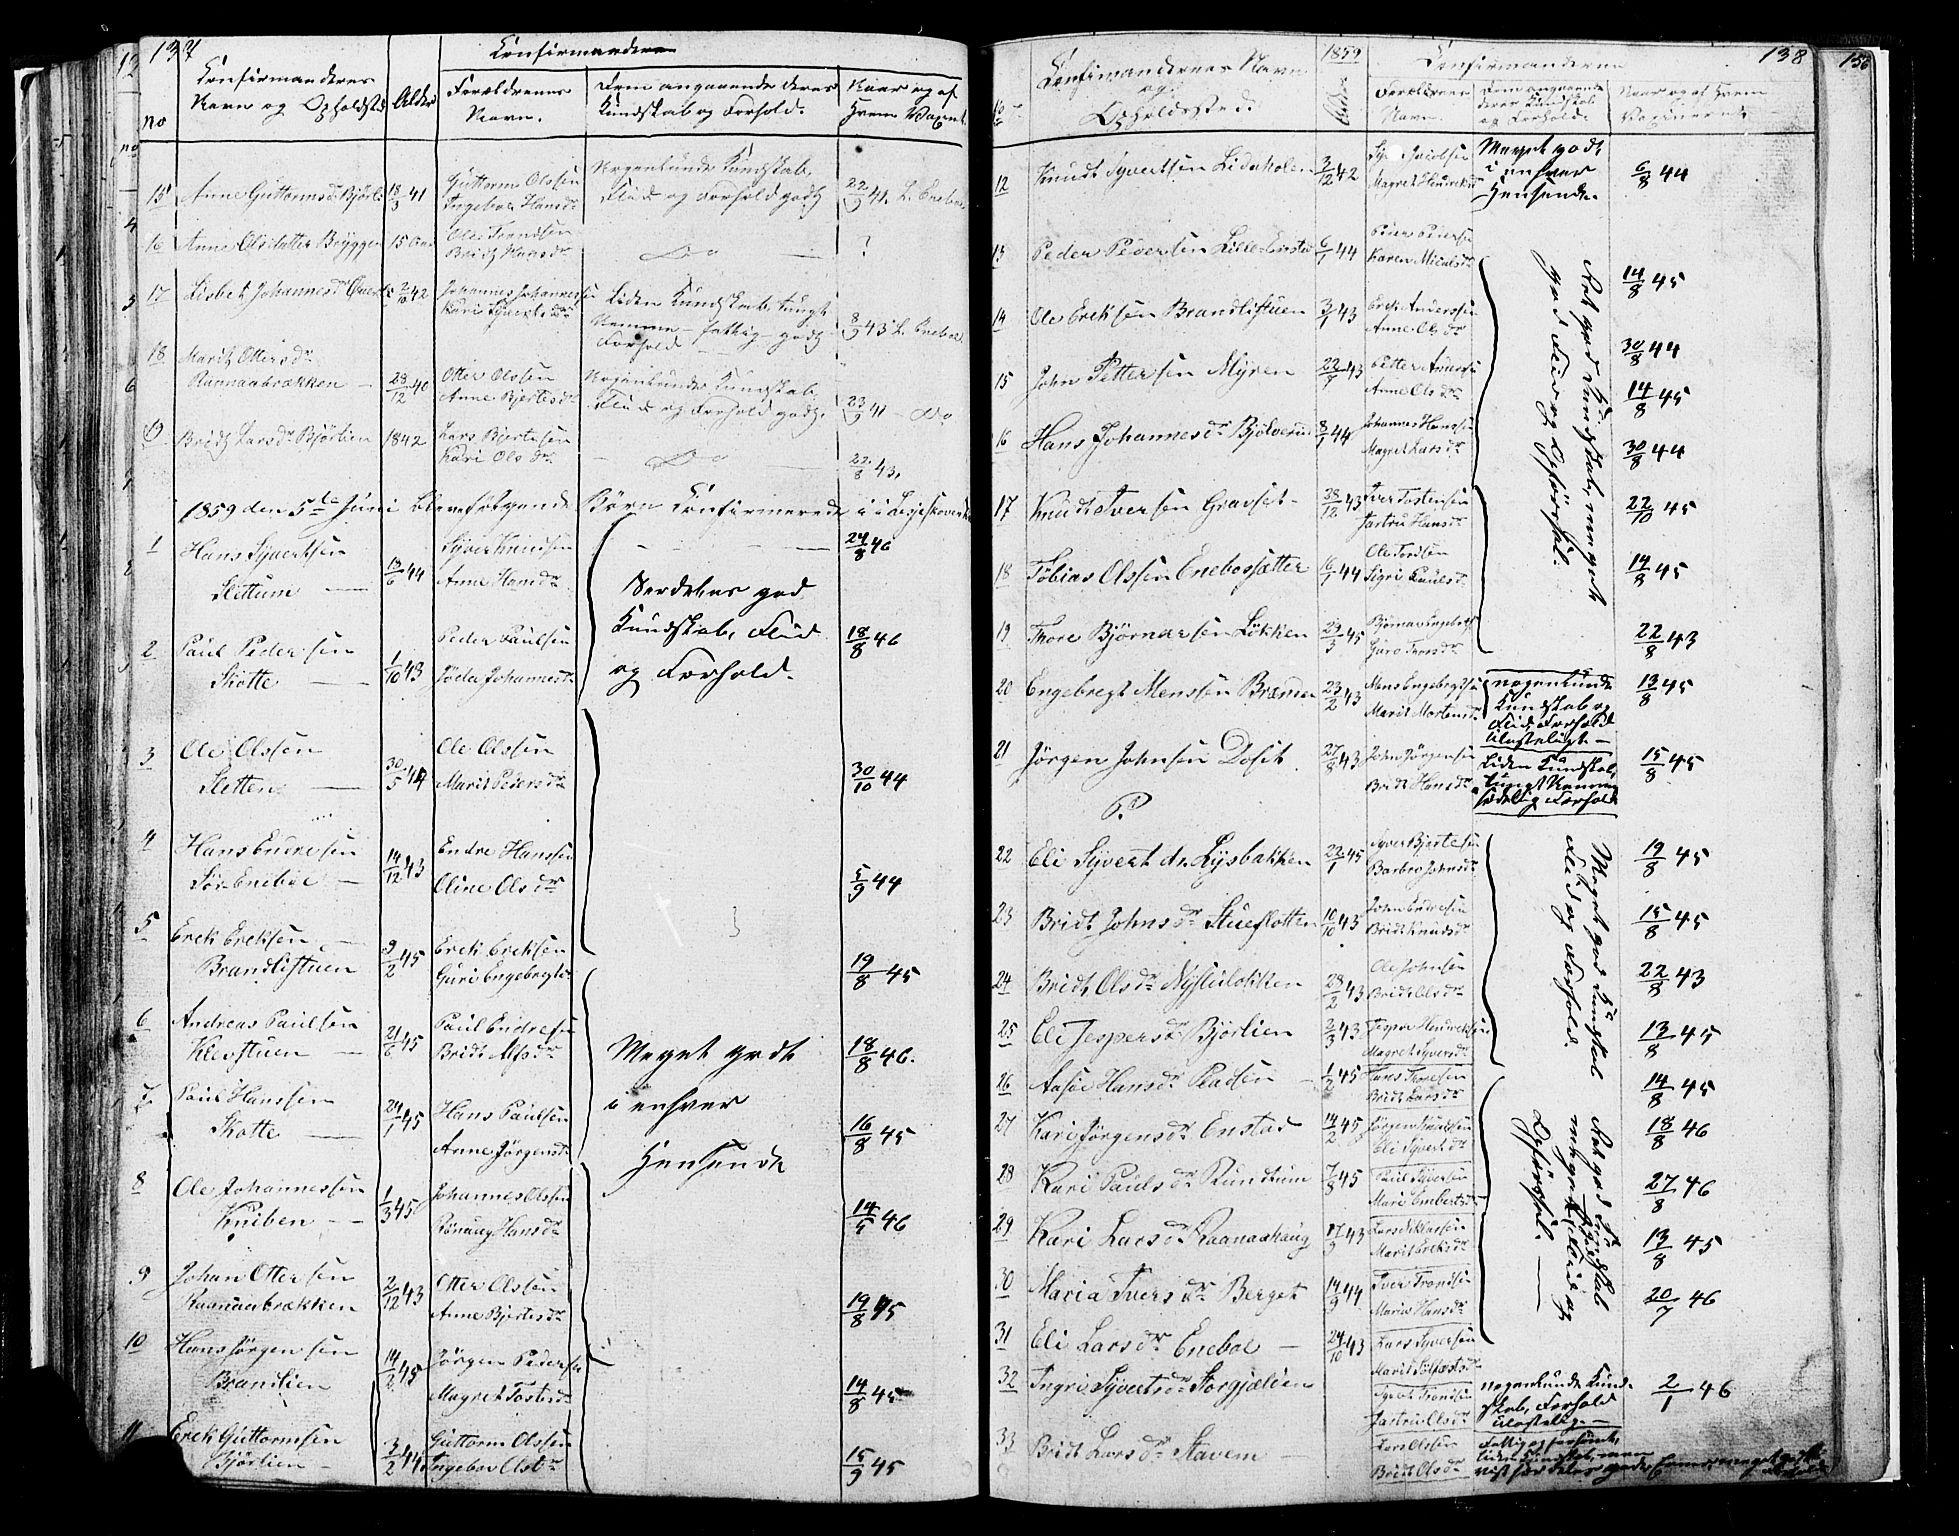 SAH, Lesja prestekontor, Klokkerbok nr. 4, 1842-1871, s. 137-138